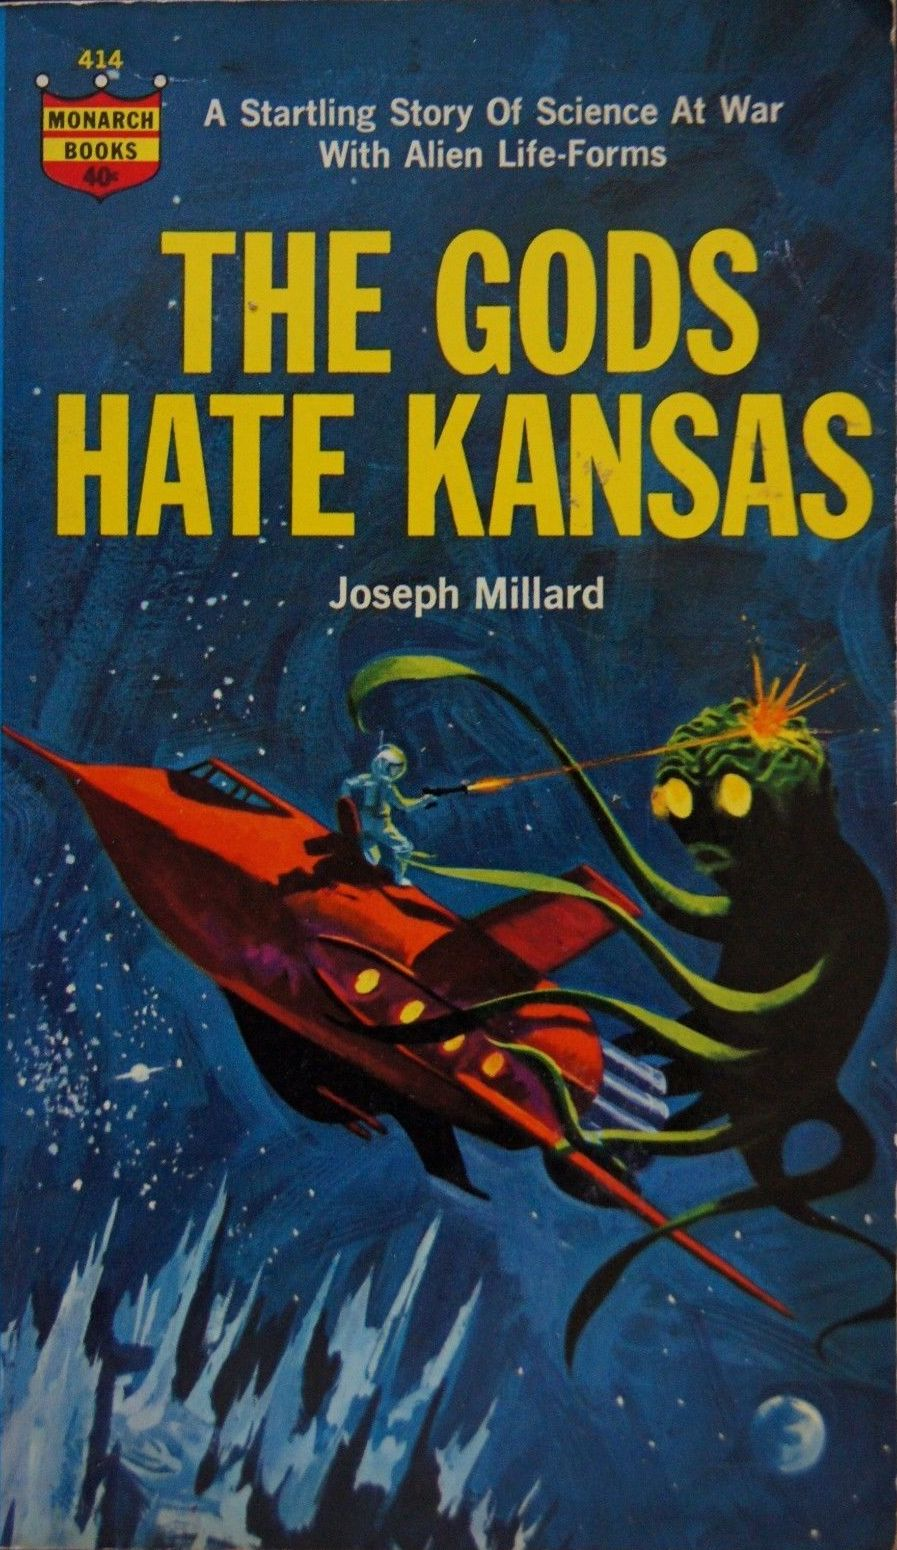 The-Gods-Hate-Kansas.jpg